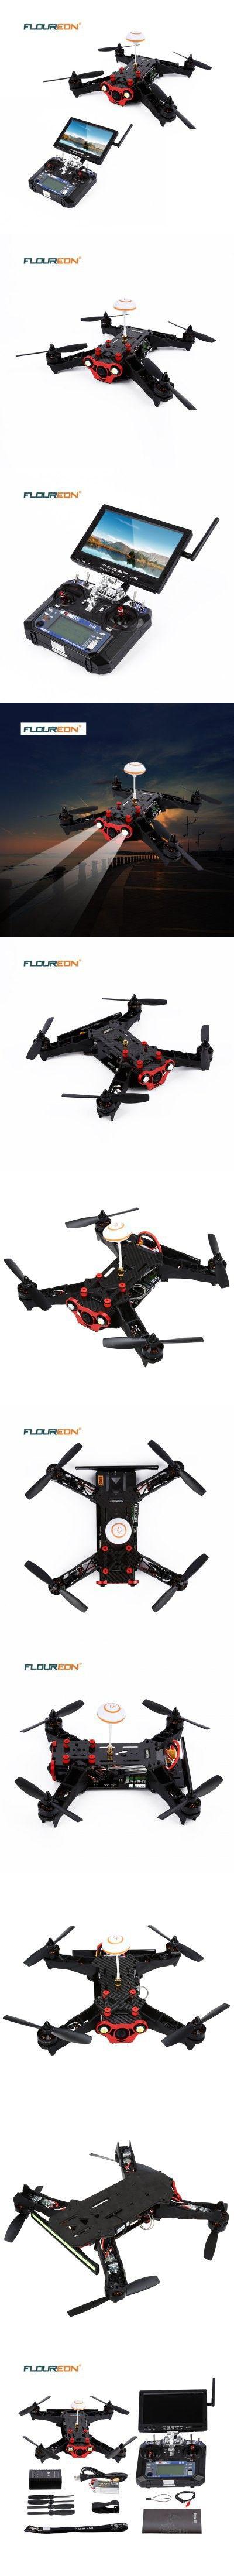 Floureon Racer 250 6CH Racing Drone FPV 6 Axis Gyro Drone